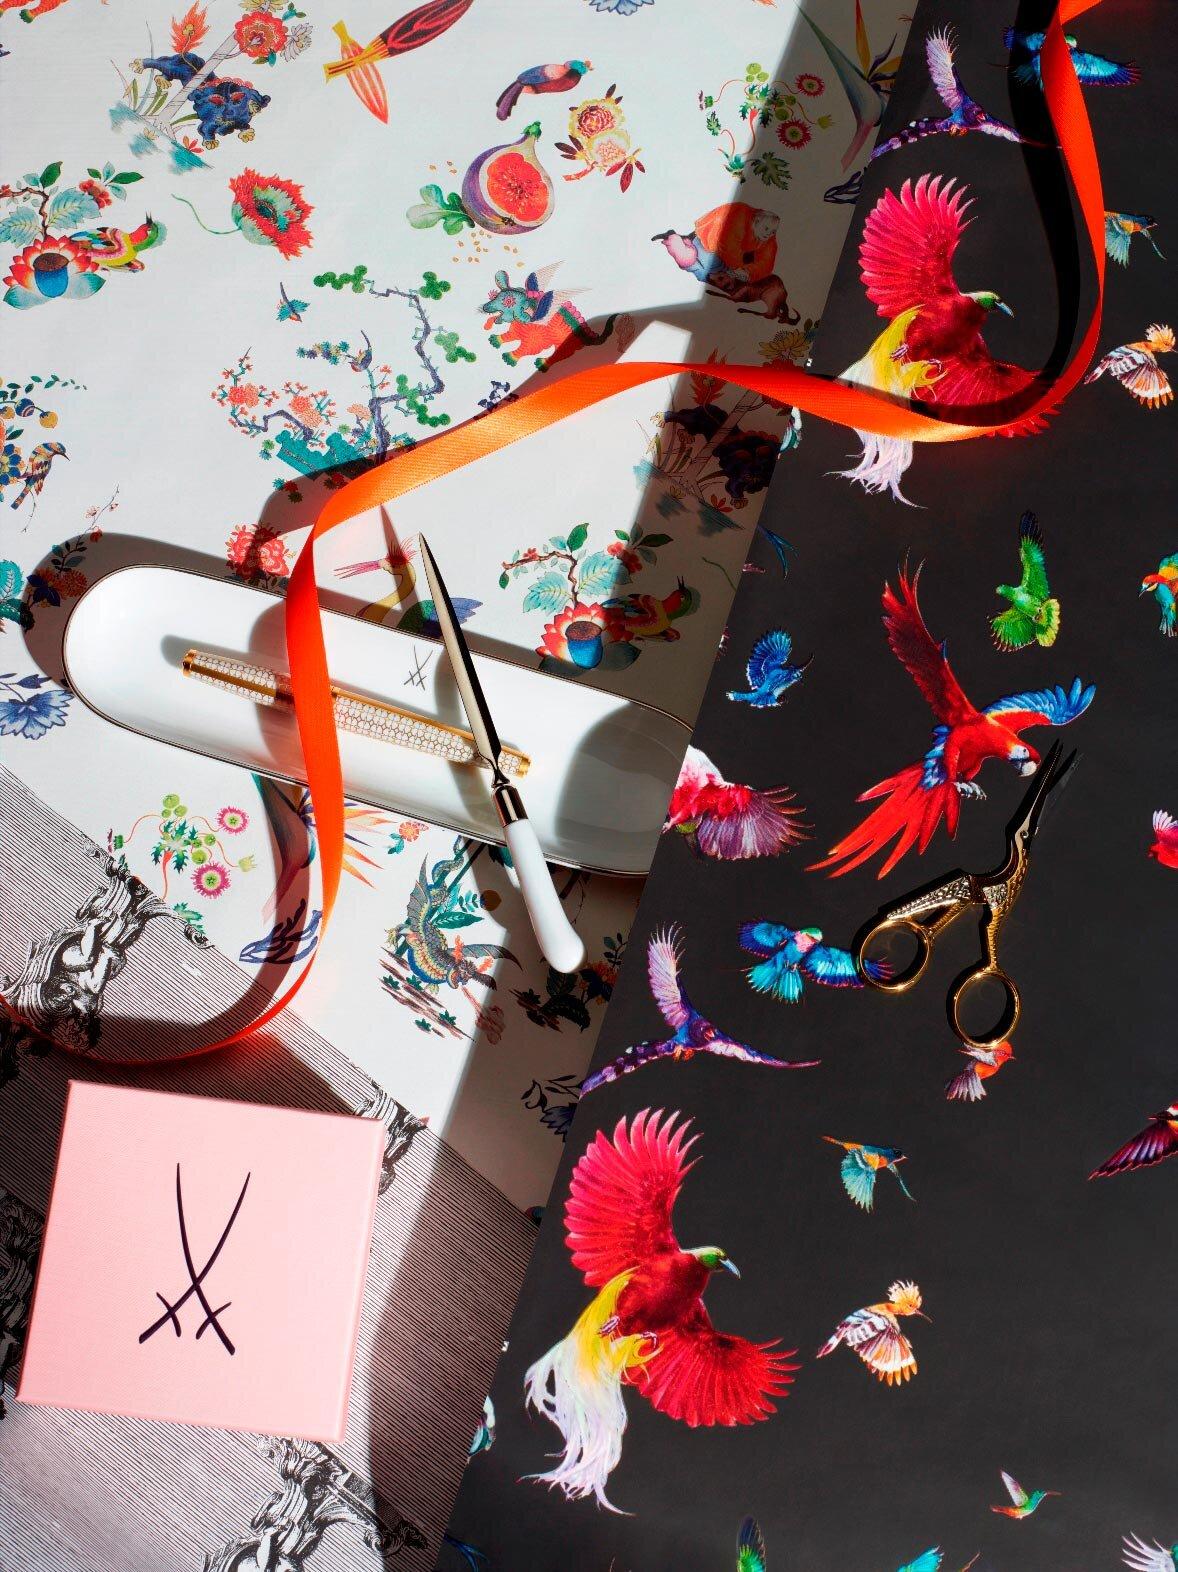 LE-MILE-Magazine-MEISSEN-porcelain-Christmas-Collection-Gift-1.jpg